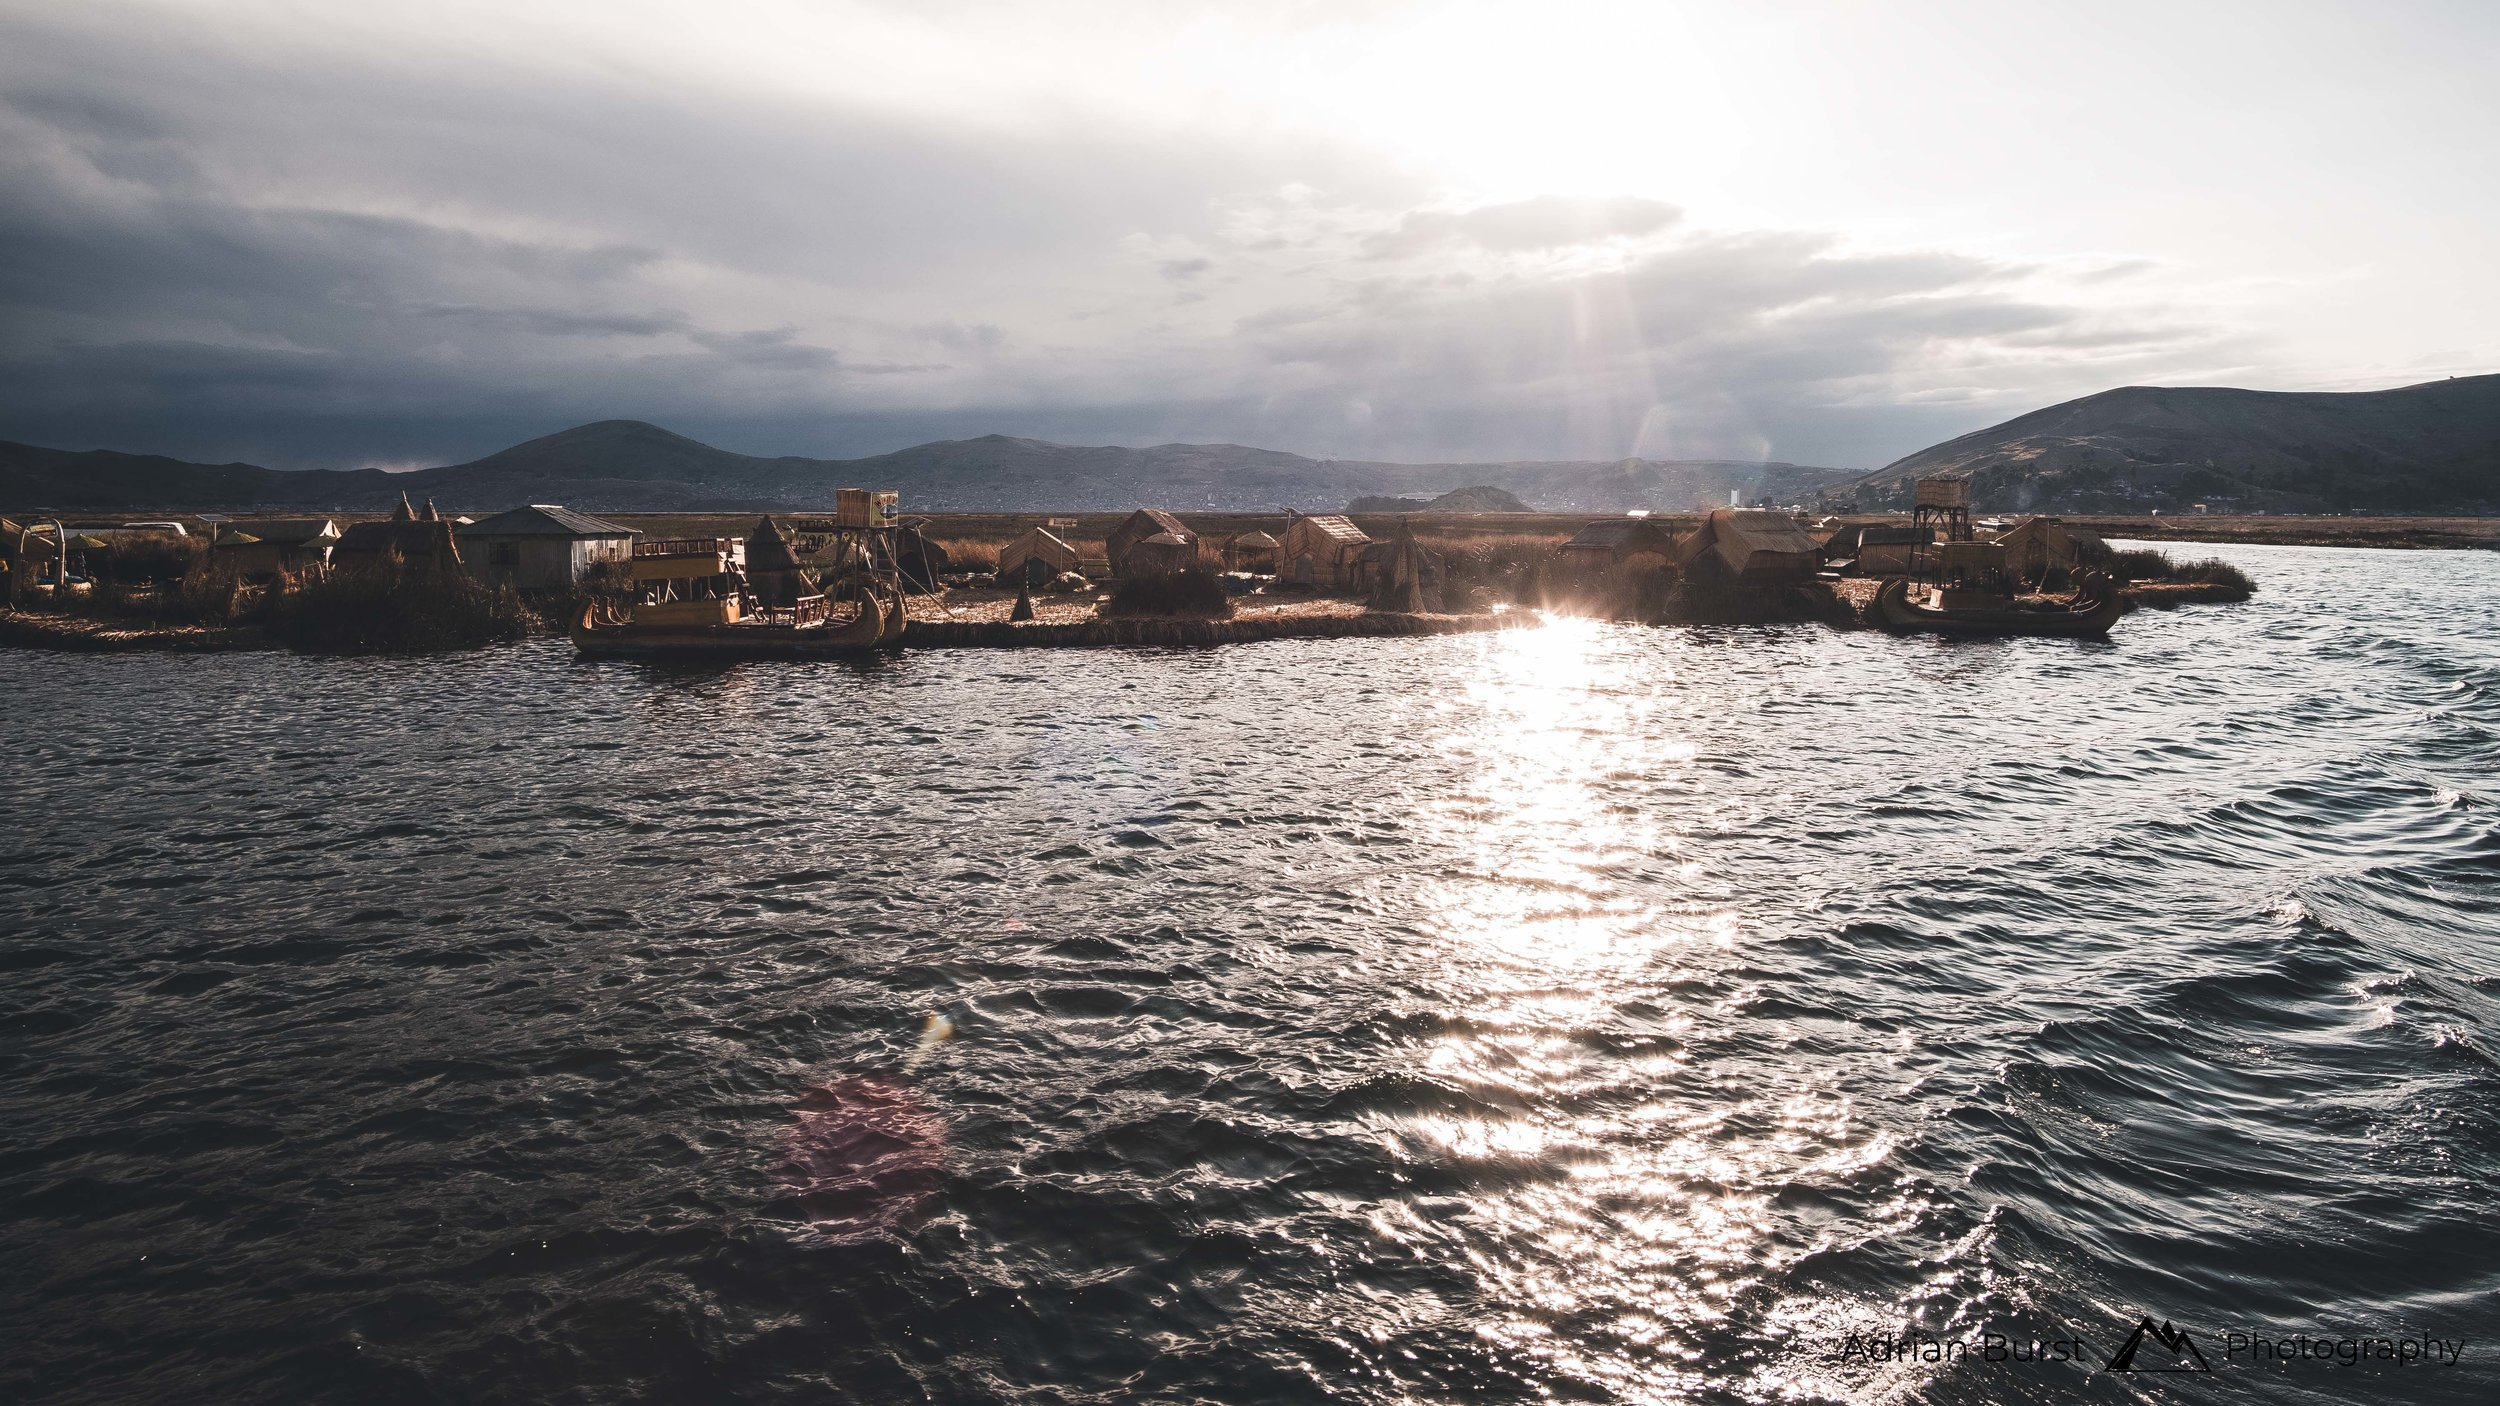 138 | Floating islands, Titicaca lake, Puno